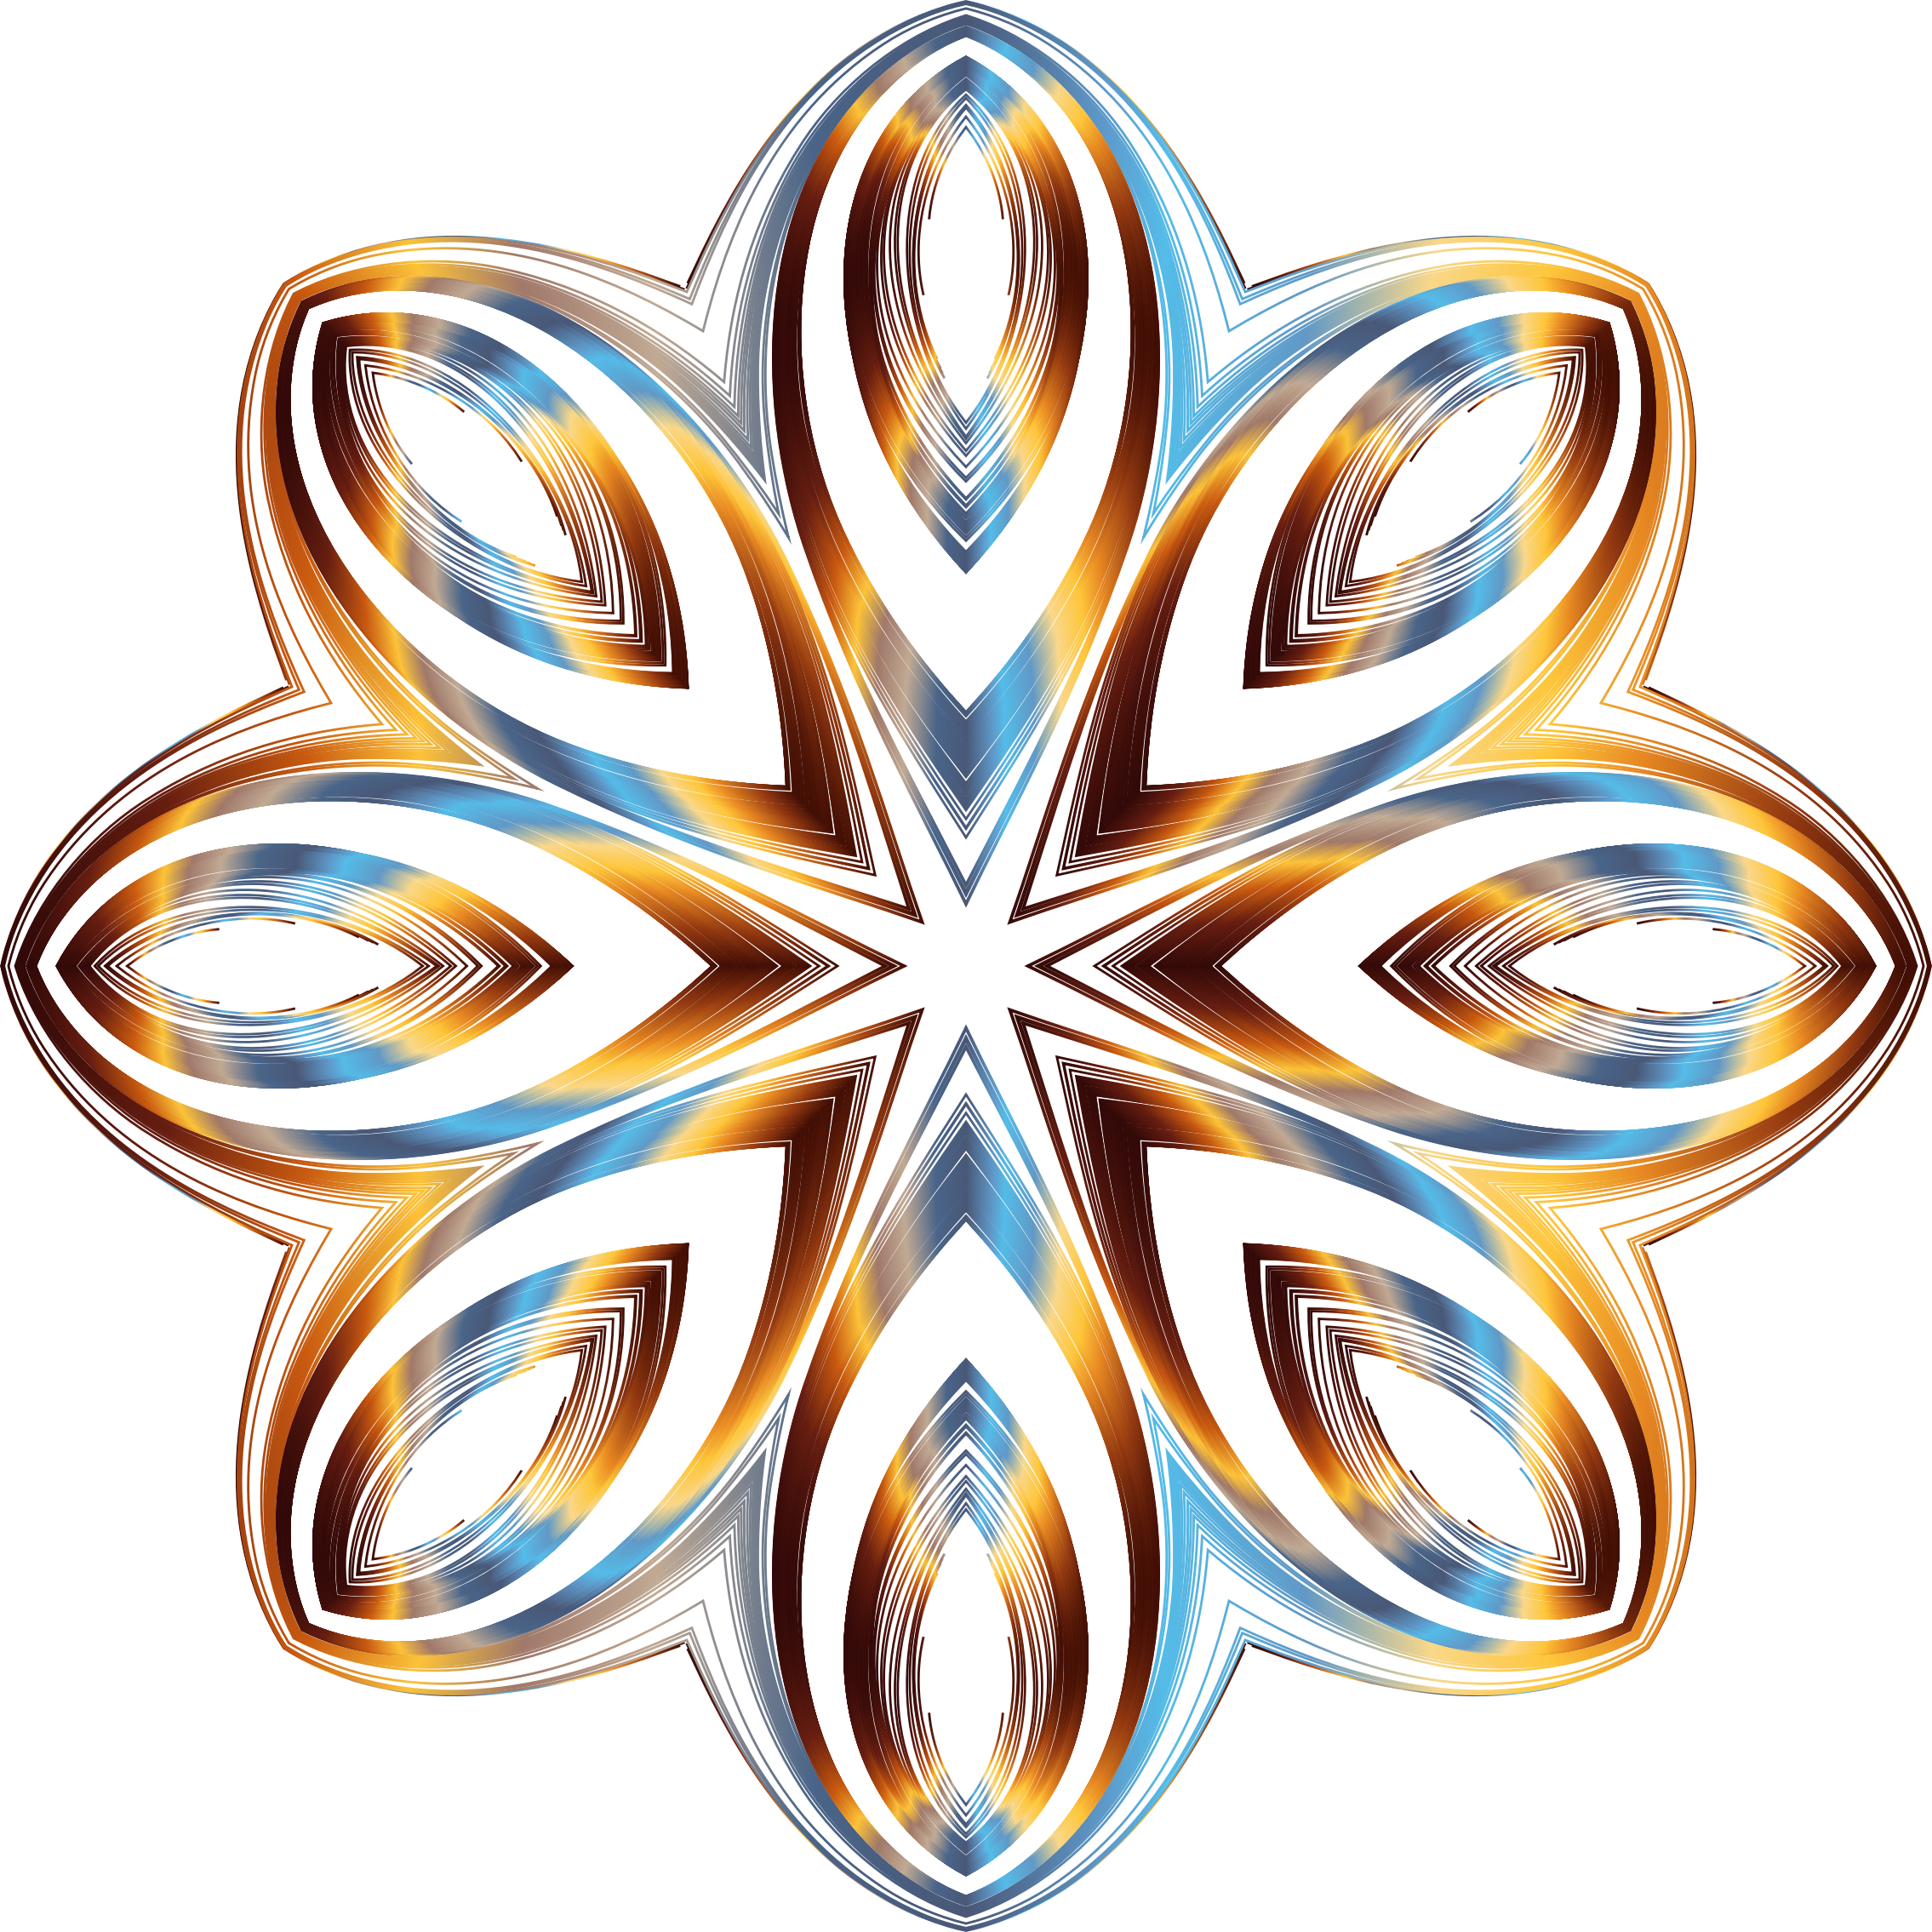 Line Art No Background : Clipart chromatic geometric line art no background